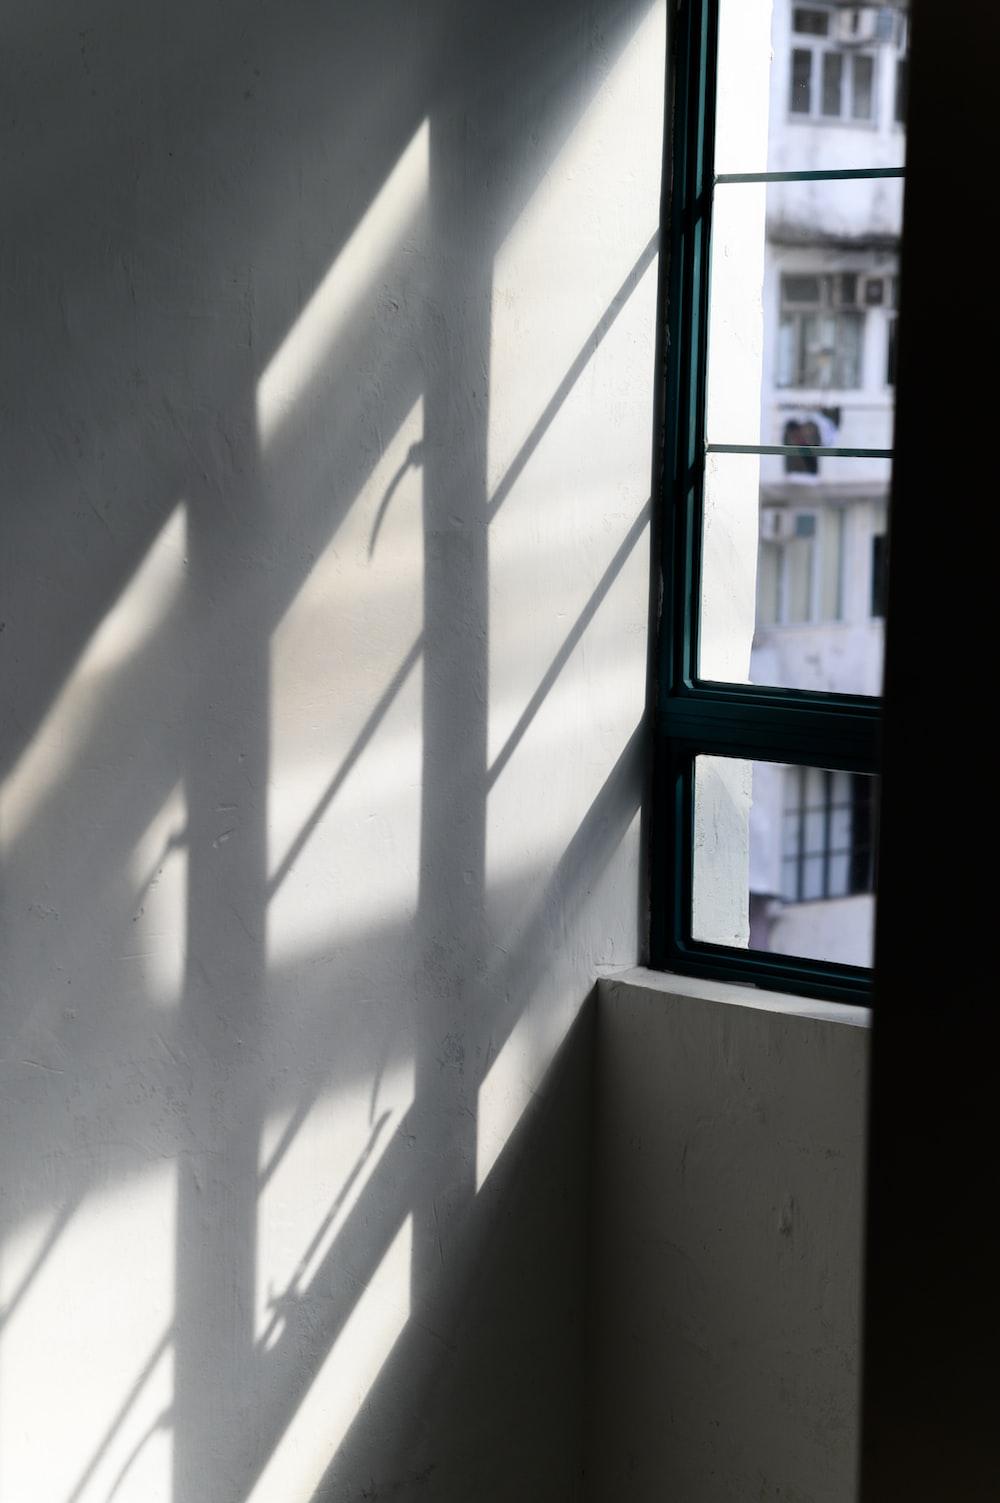 apartment corridor wall with window shadow